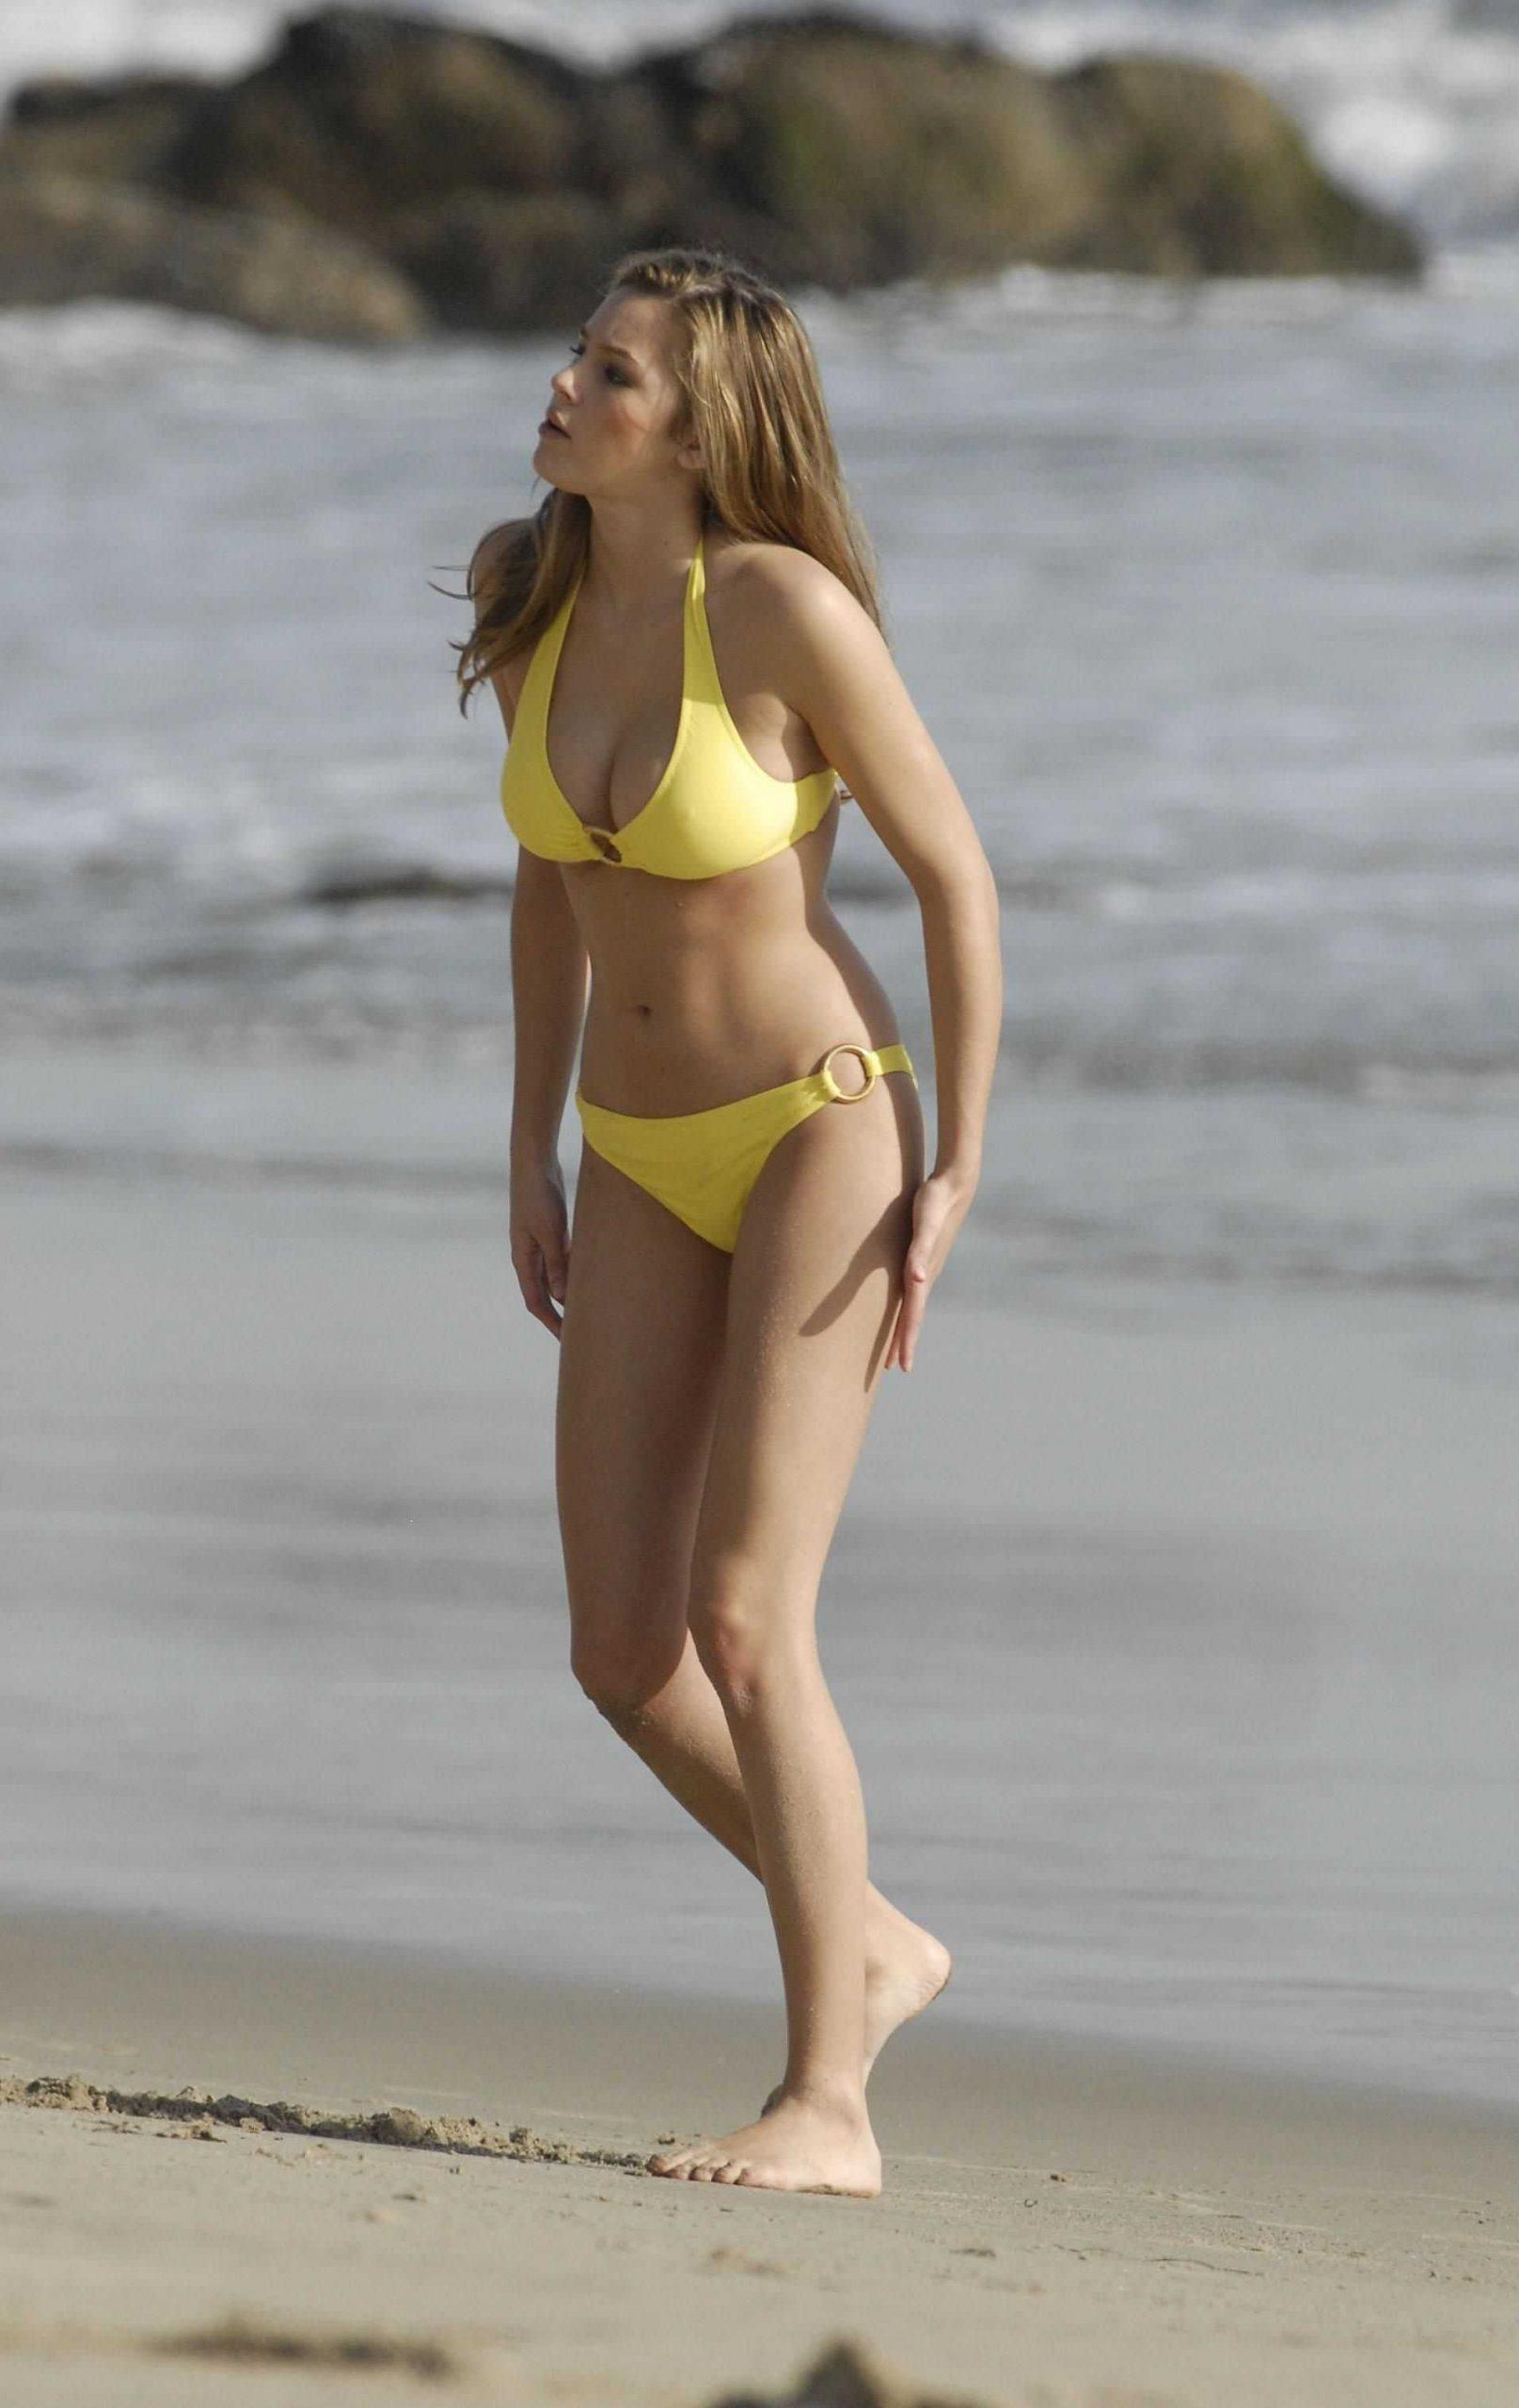 Keeley Hazell sexy yellow bikini pic